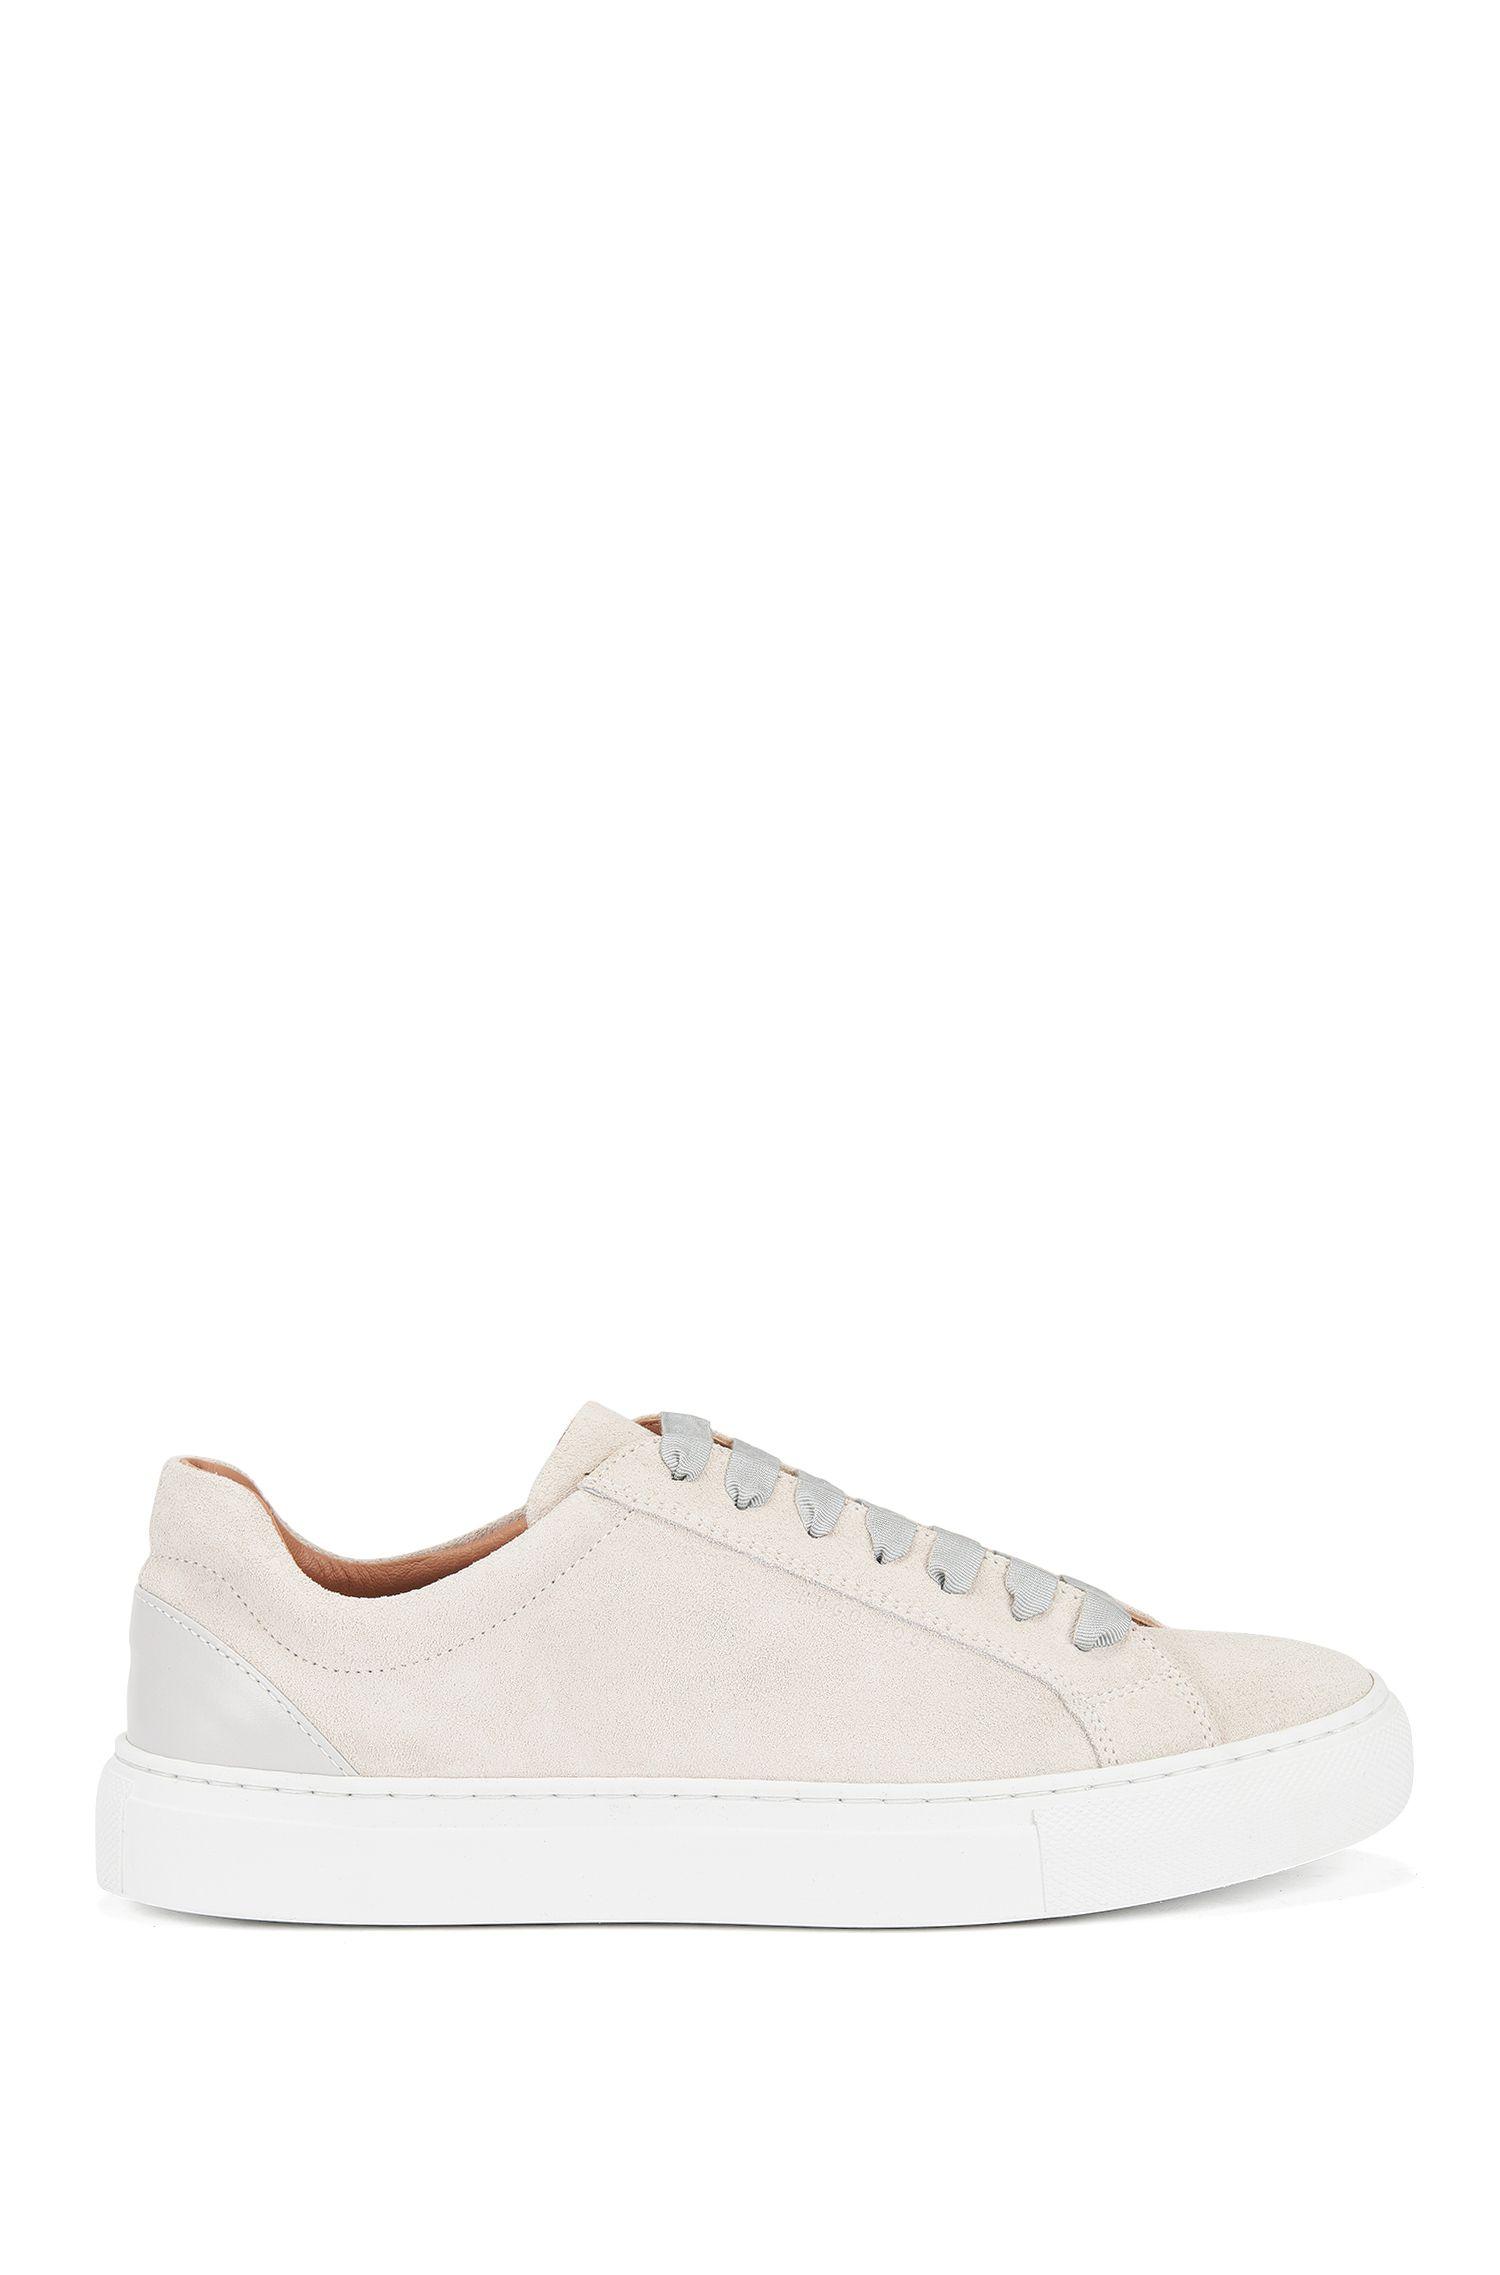 Sneakers aus italienischem Leder